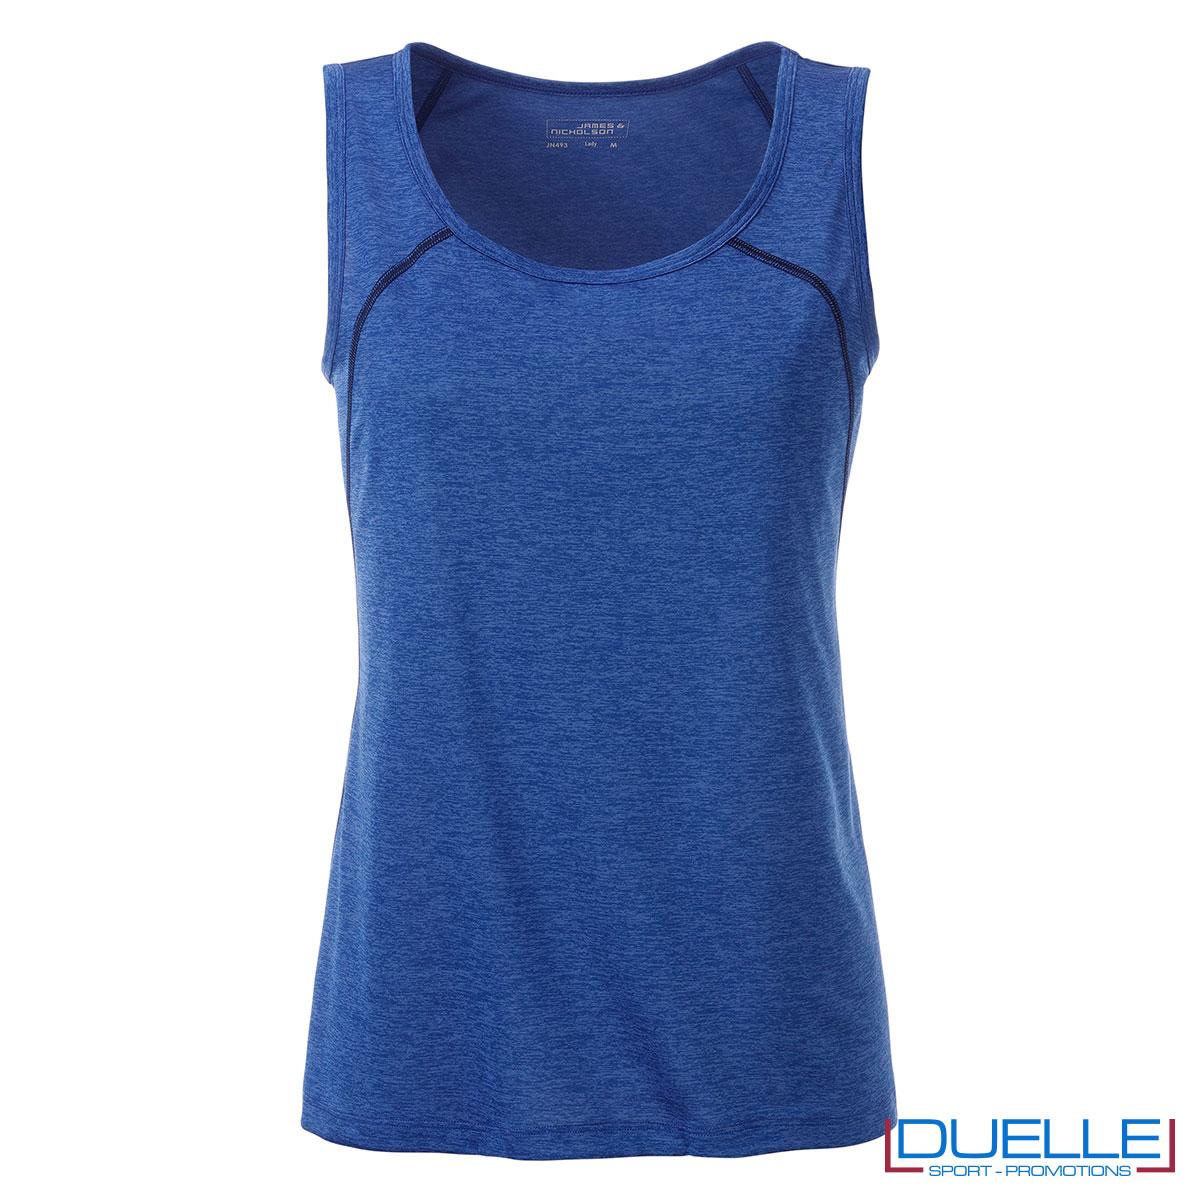 Canottiera blu melange donna per sport